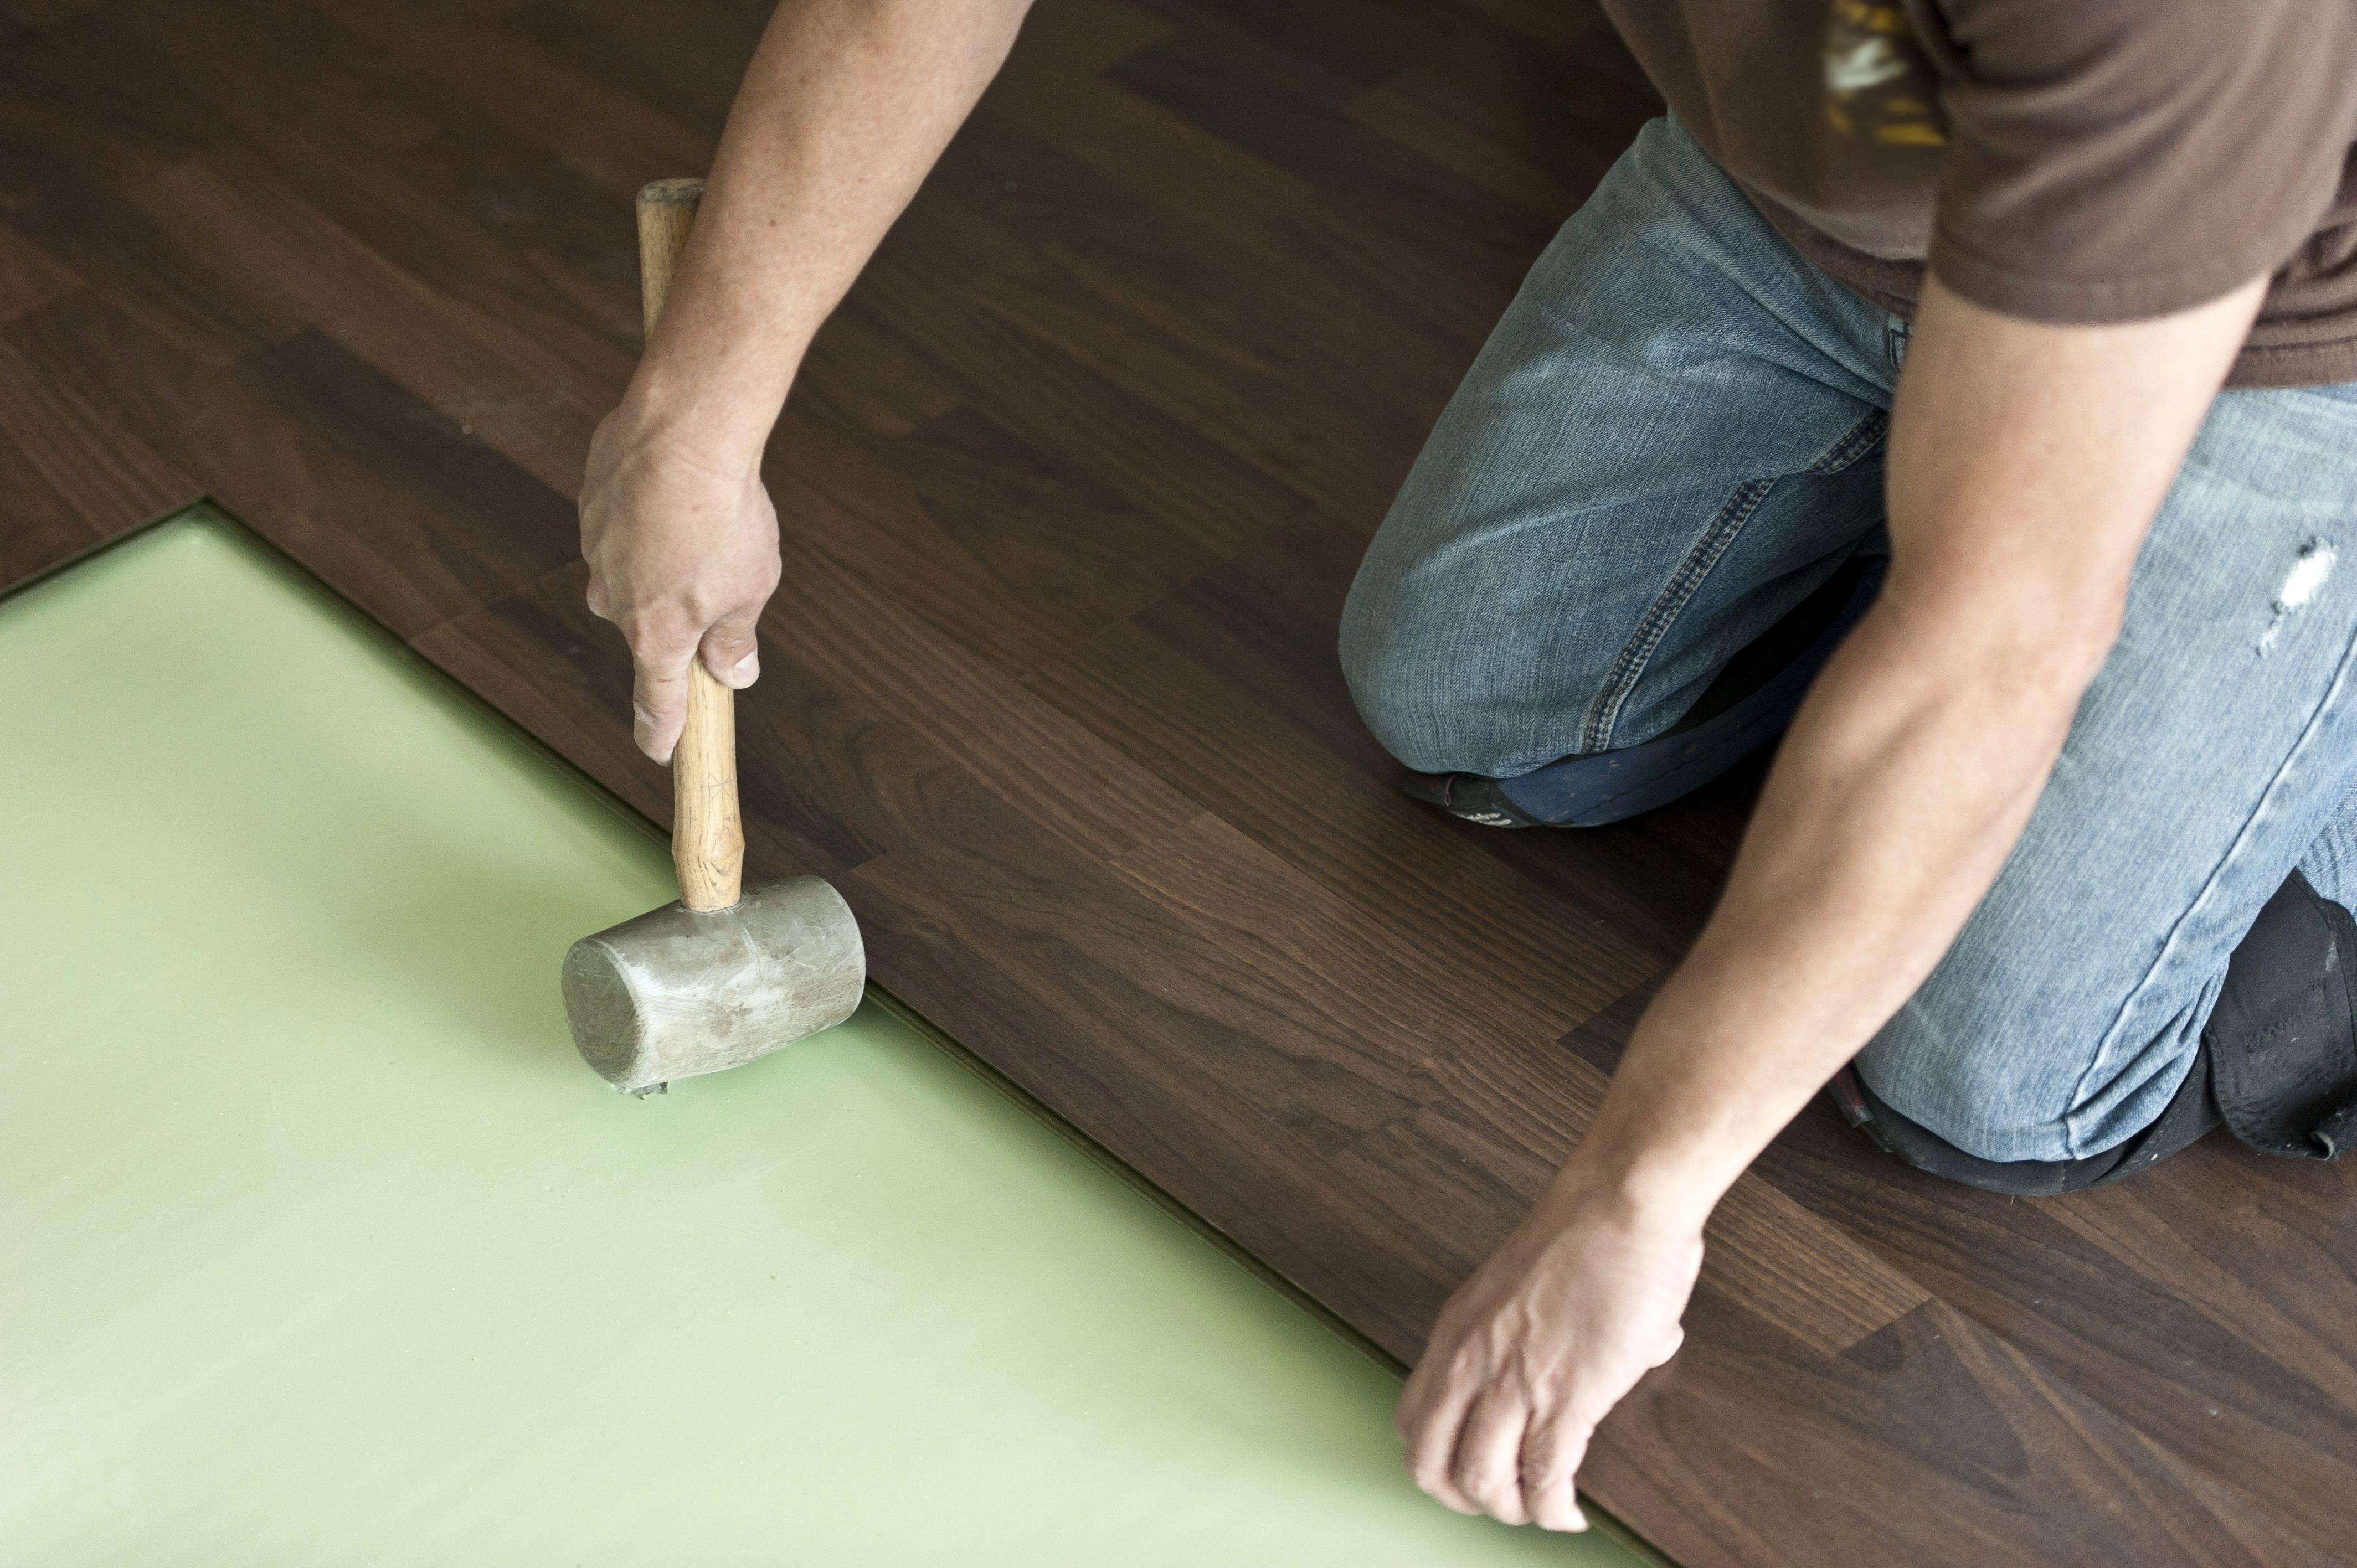 3 8 inch engineered hardwood flooring of can a foam pad be use under solid hardwood flooring with regard to installing hardwood floor 155149312 57e967d45f9b586c35ade84a